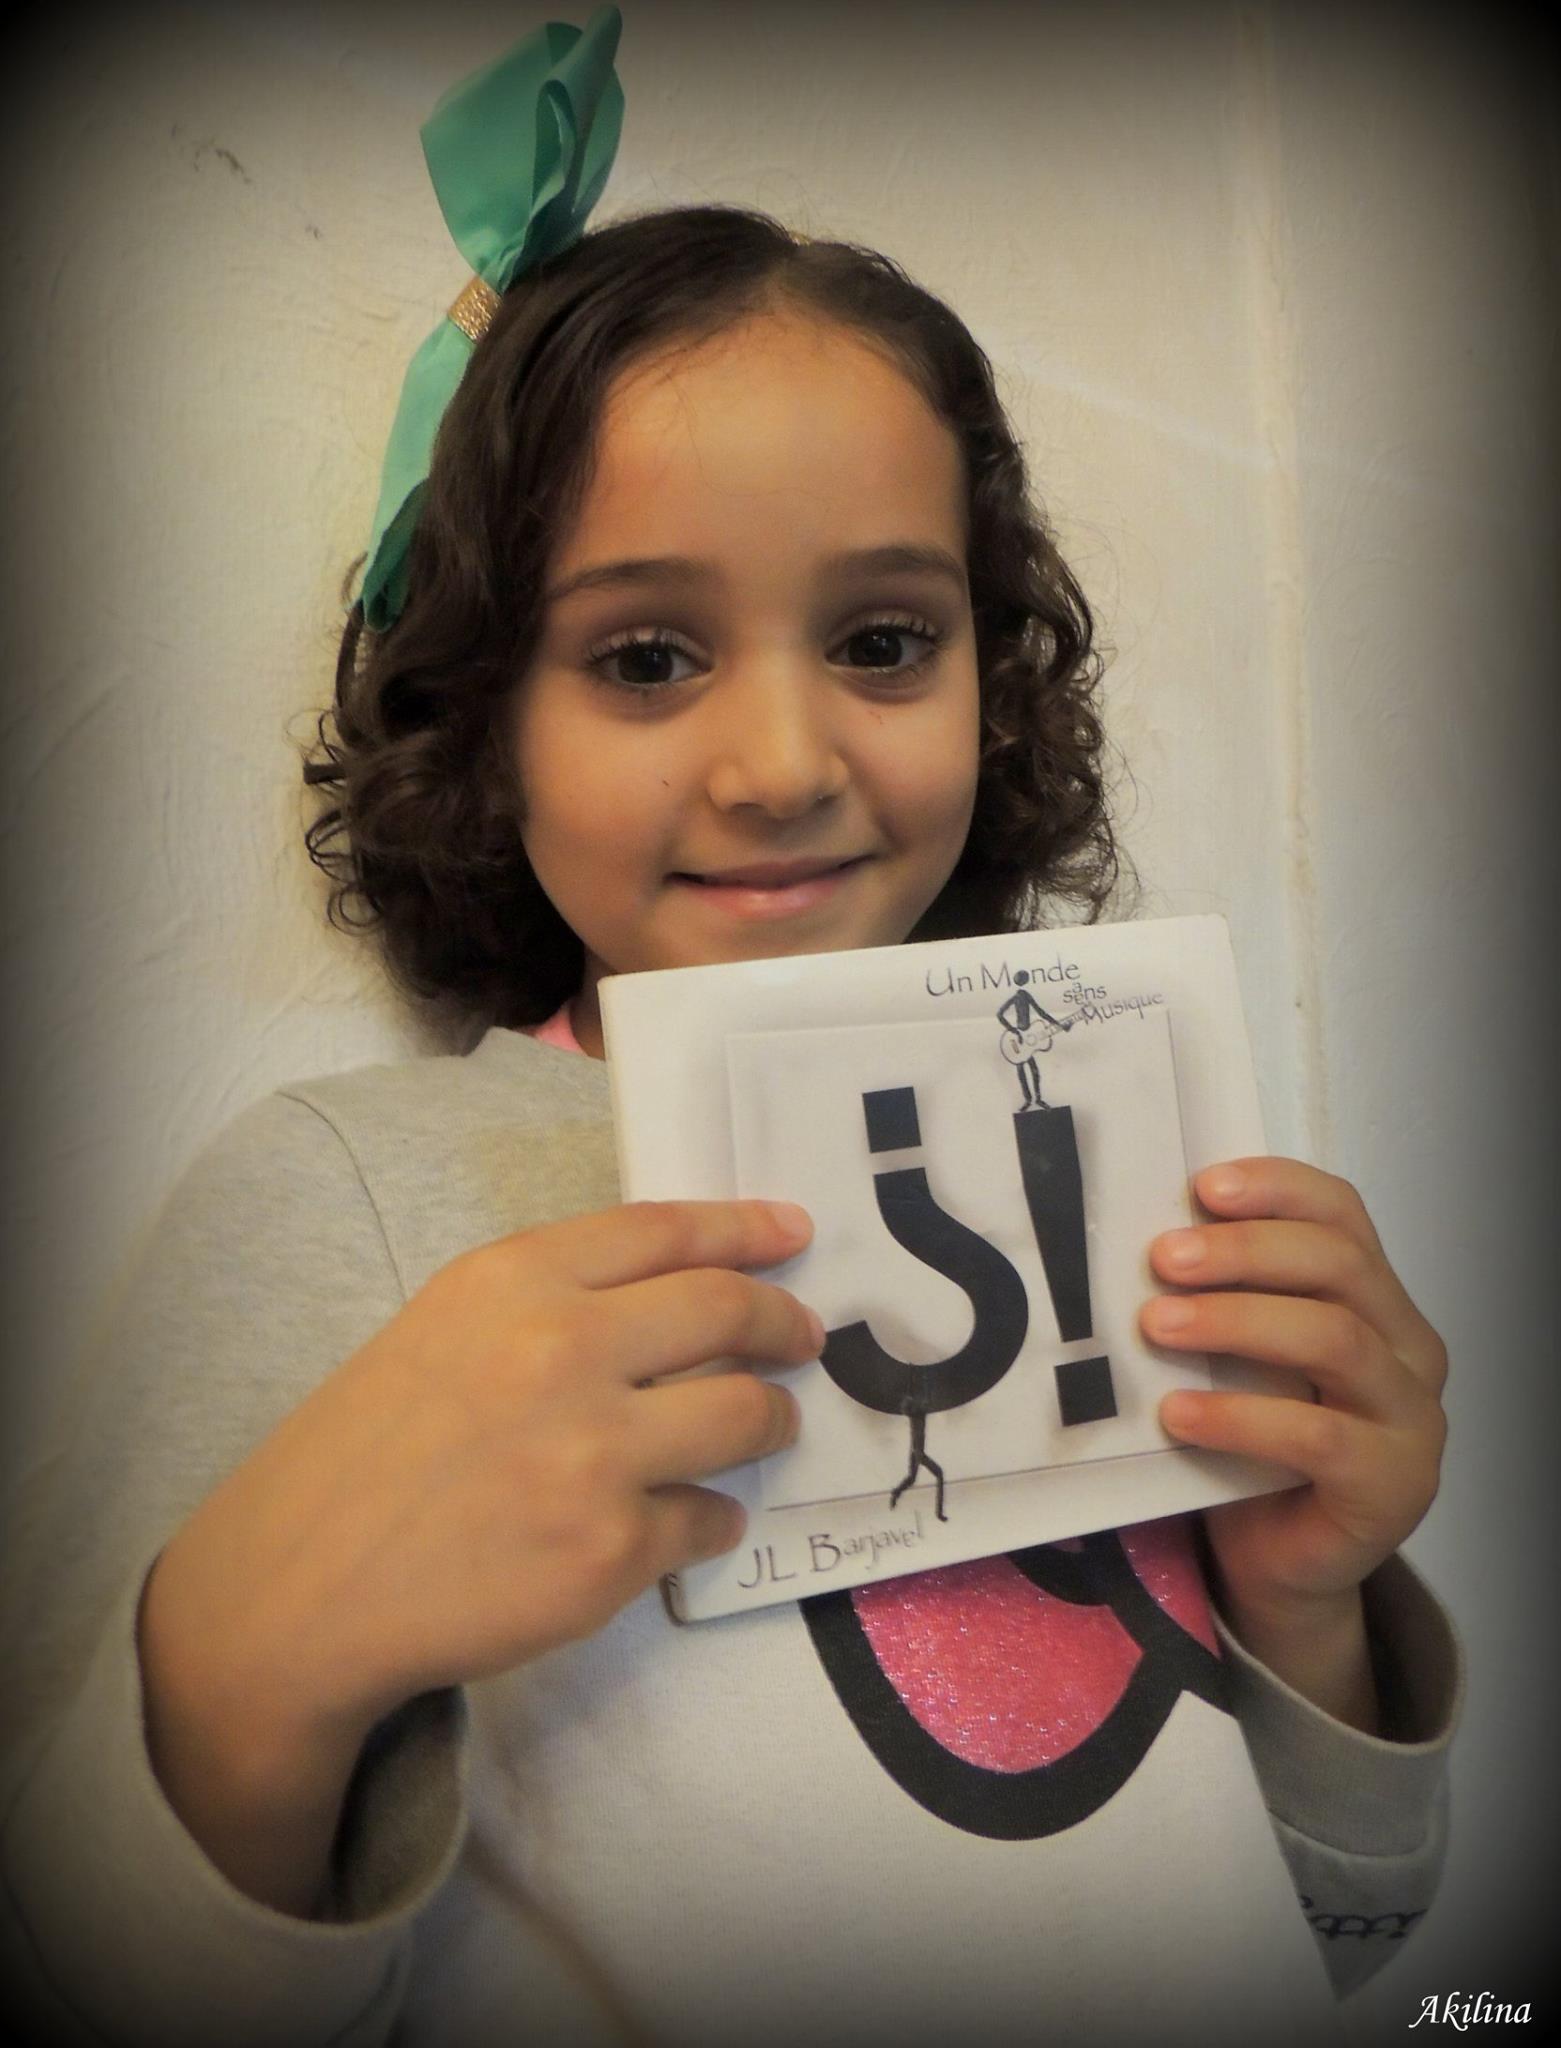 JL Album by Sylvia 173.jpg